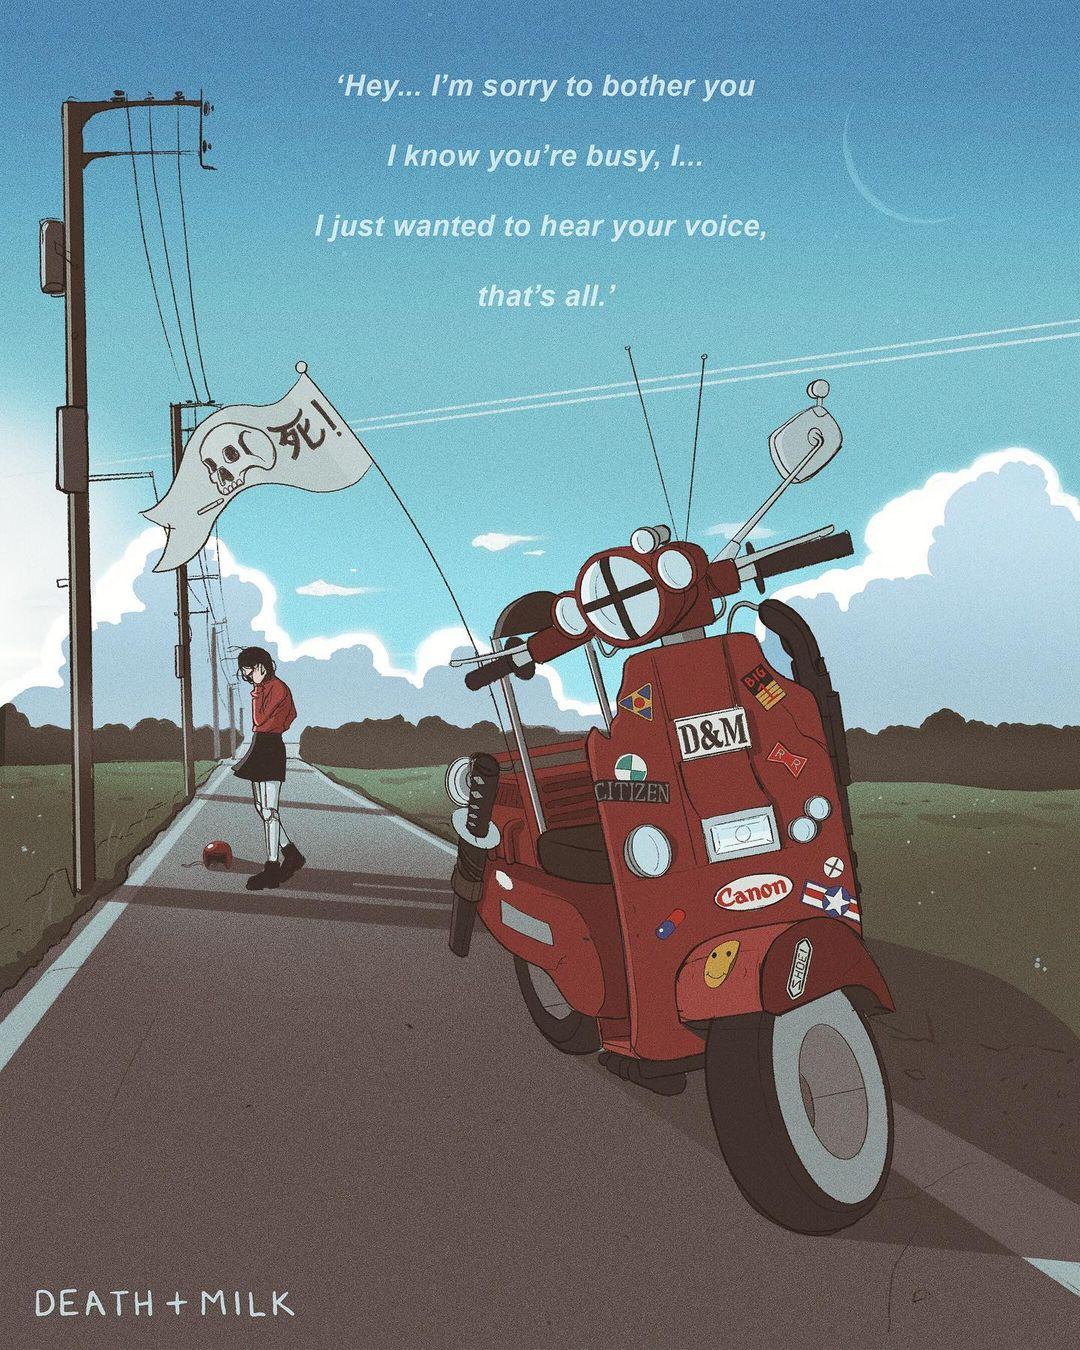 киберпанк-иллюстрации от Death & Milk (22).jpg